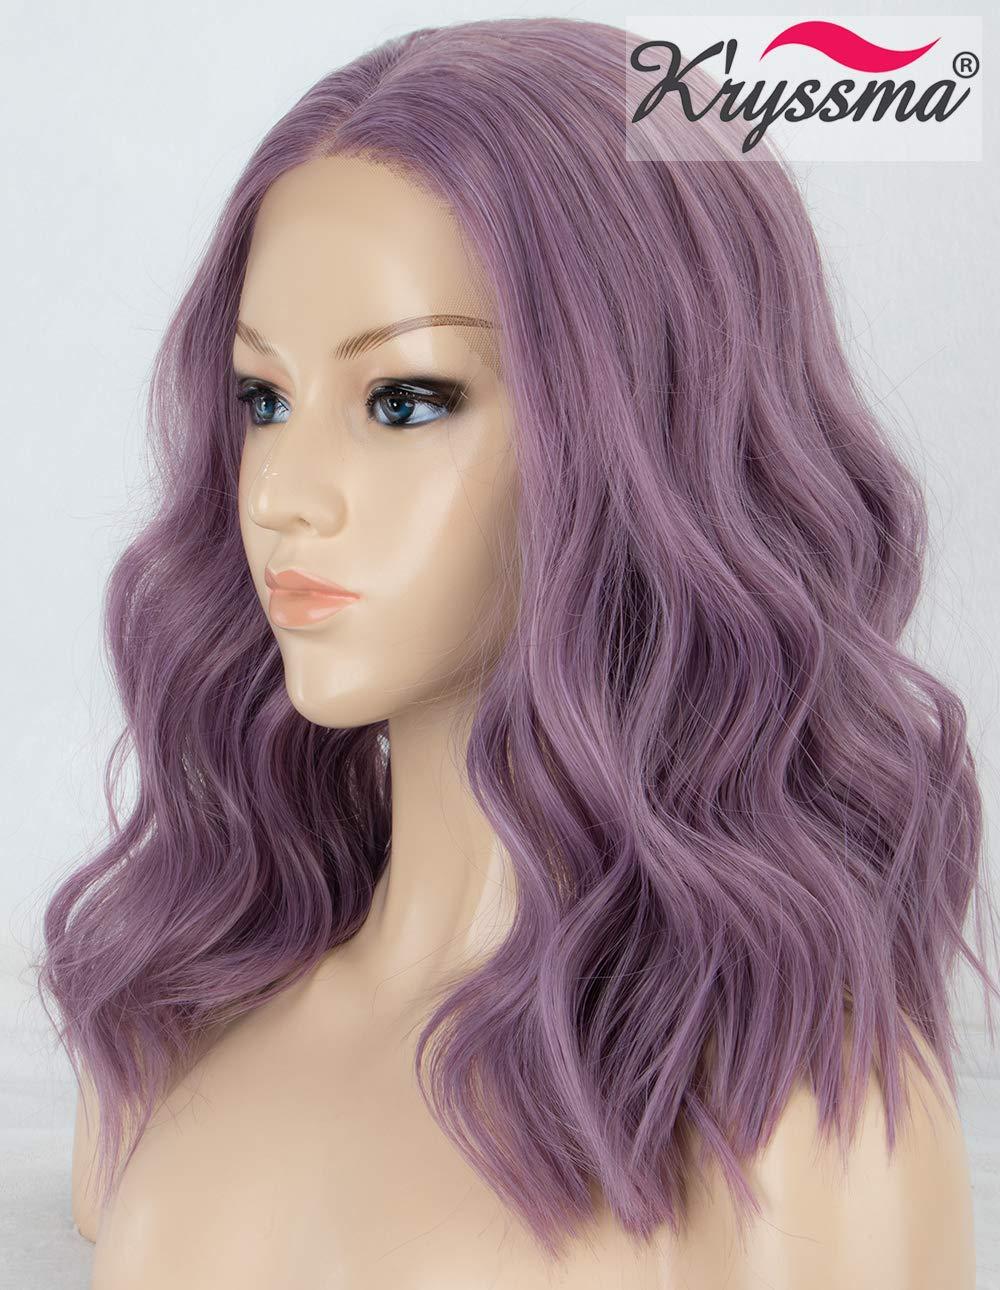 K'ryssma Ash Purple Lace Front Bob Wig Middle